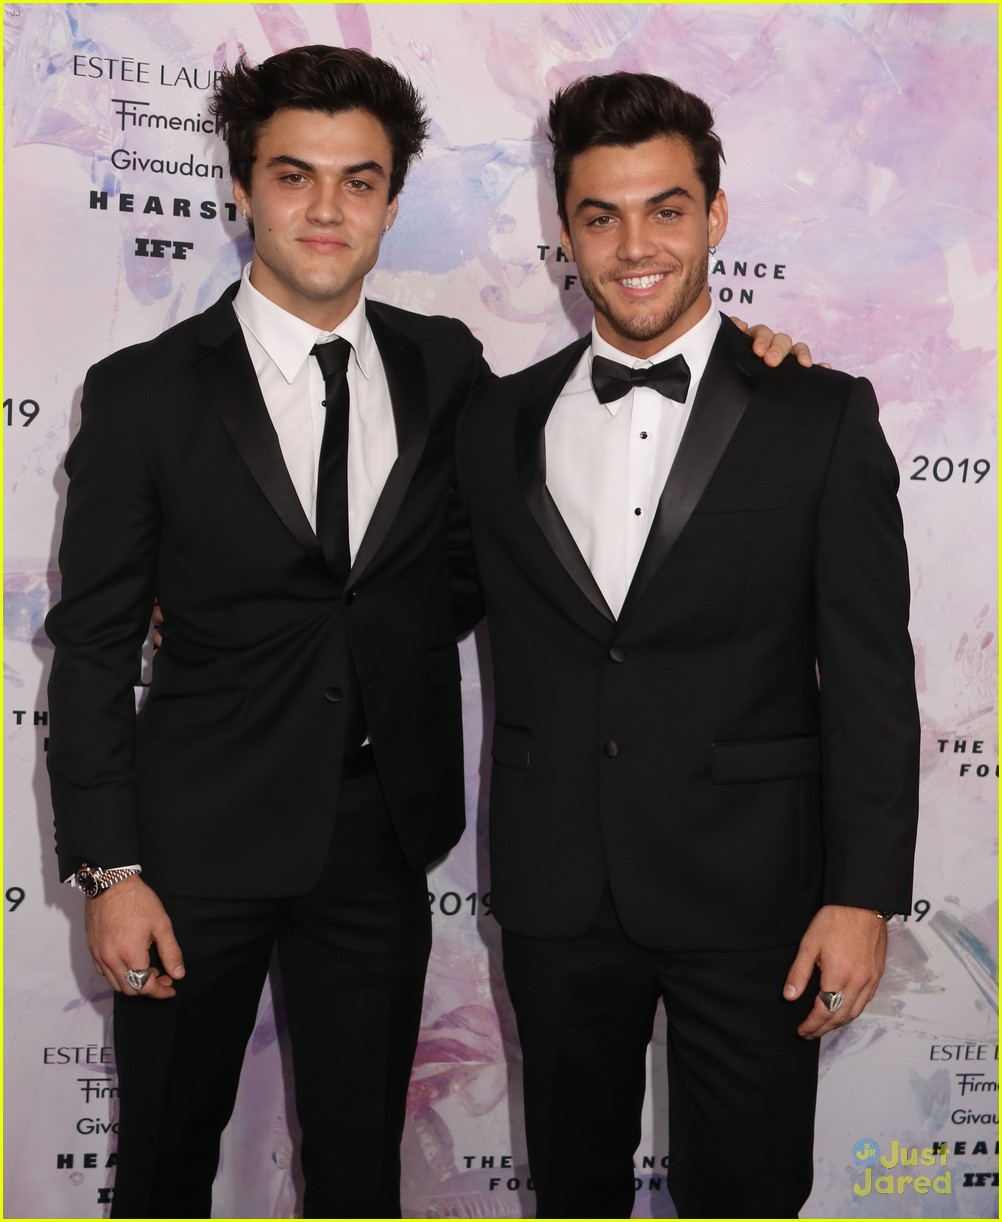 Ethan & Grayson Dolan Wear Bowties For Fragrance Foundation Awards